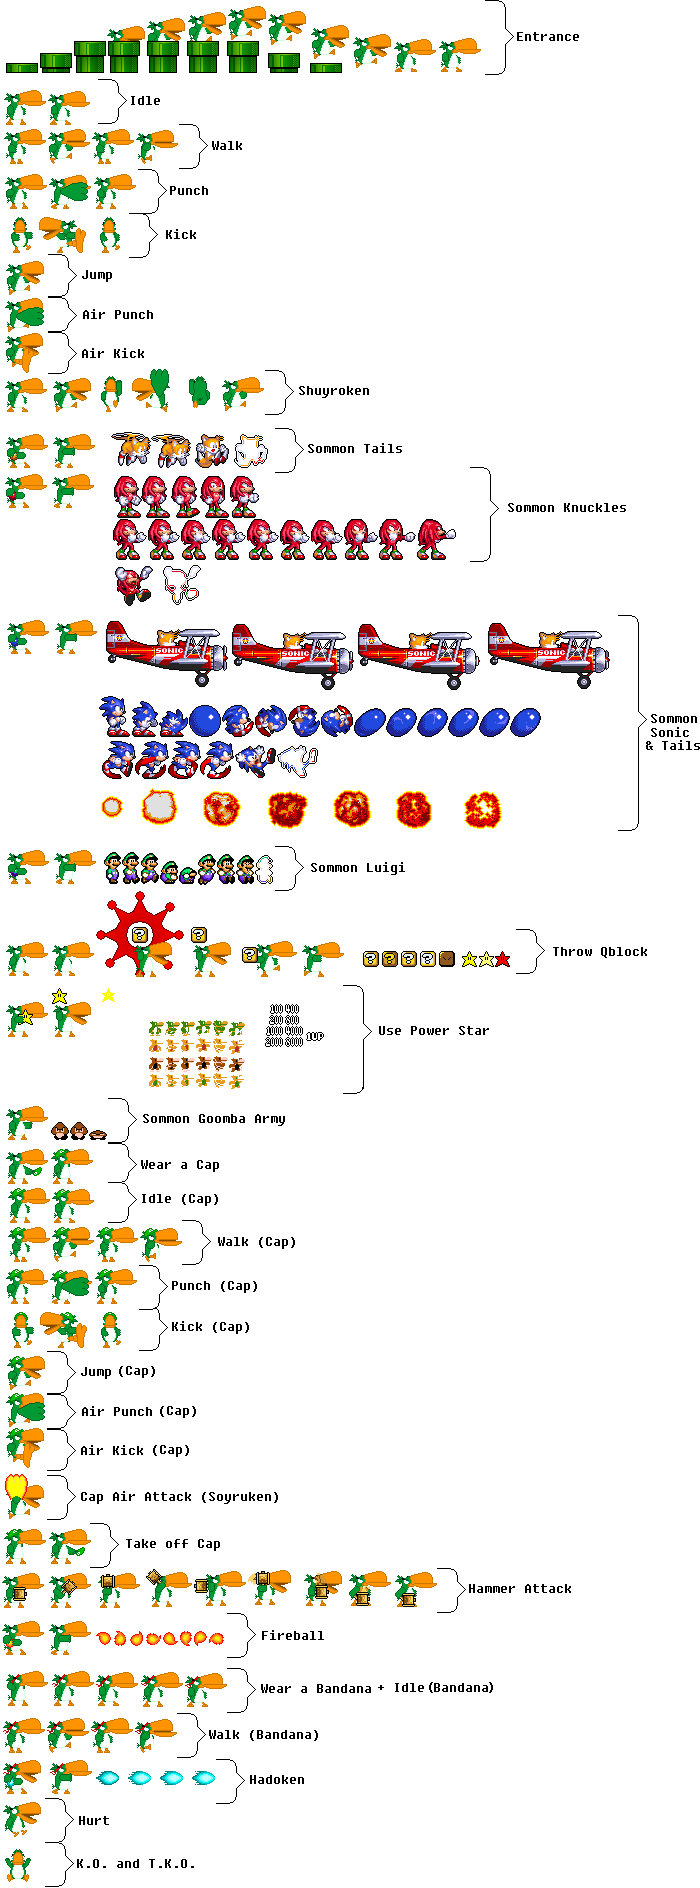 [Image: tarkan809_fight.png]